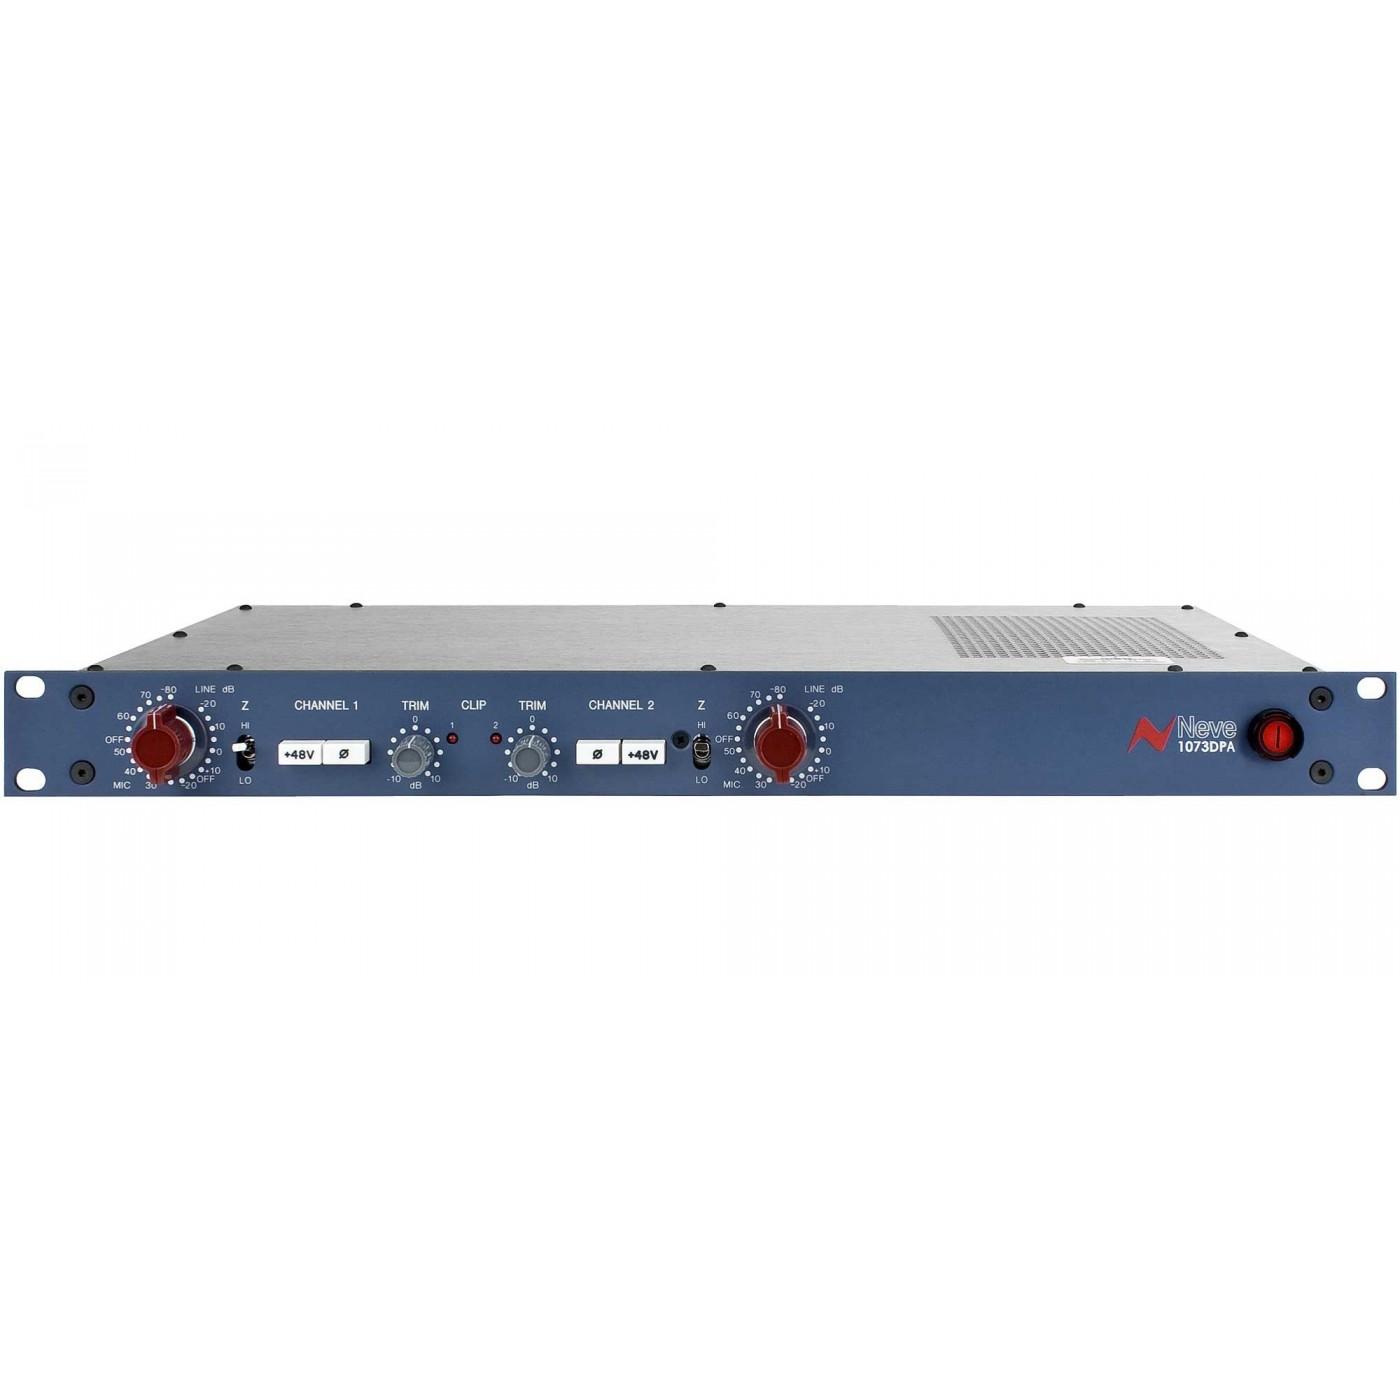 Neve 1073 DPA   Rage Audio